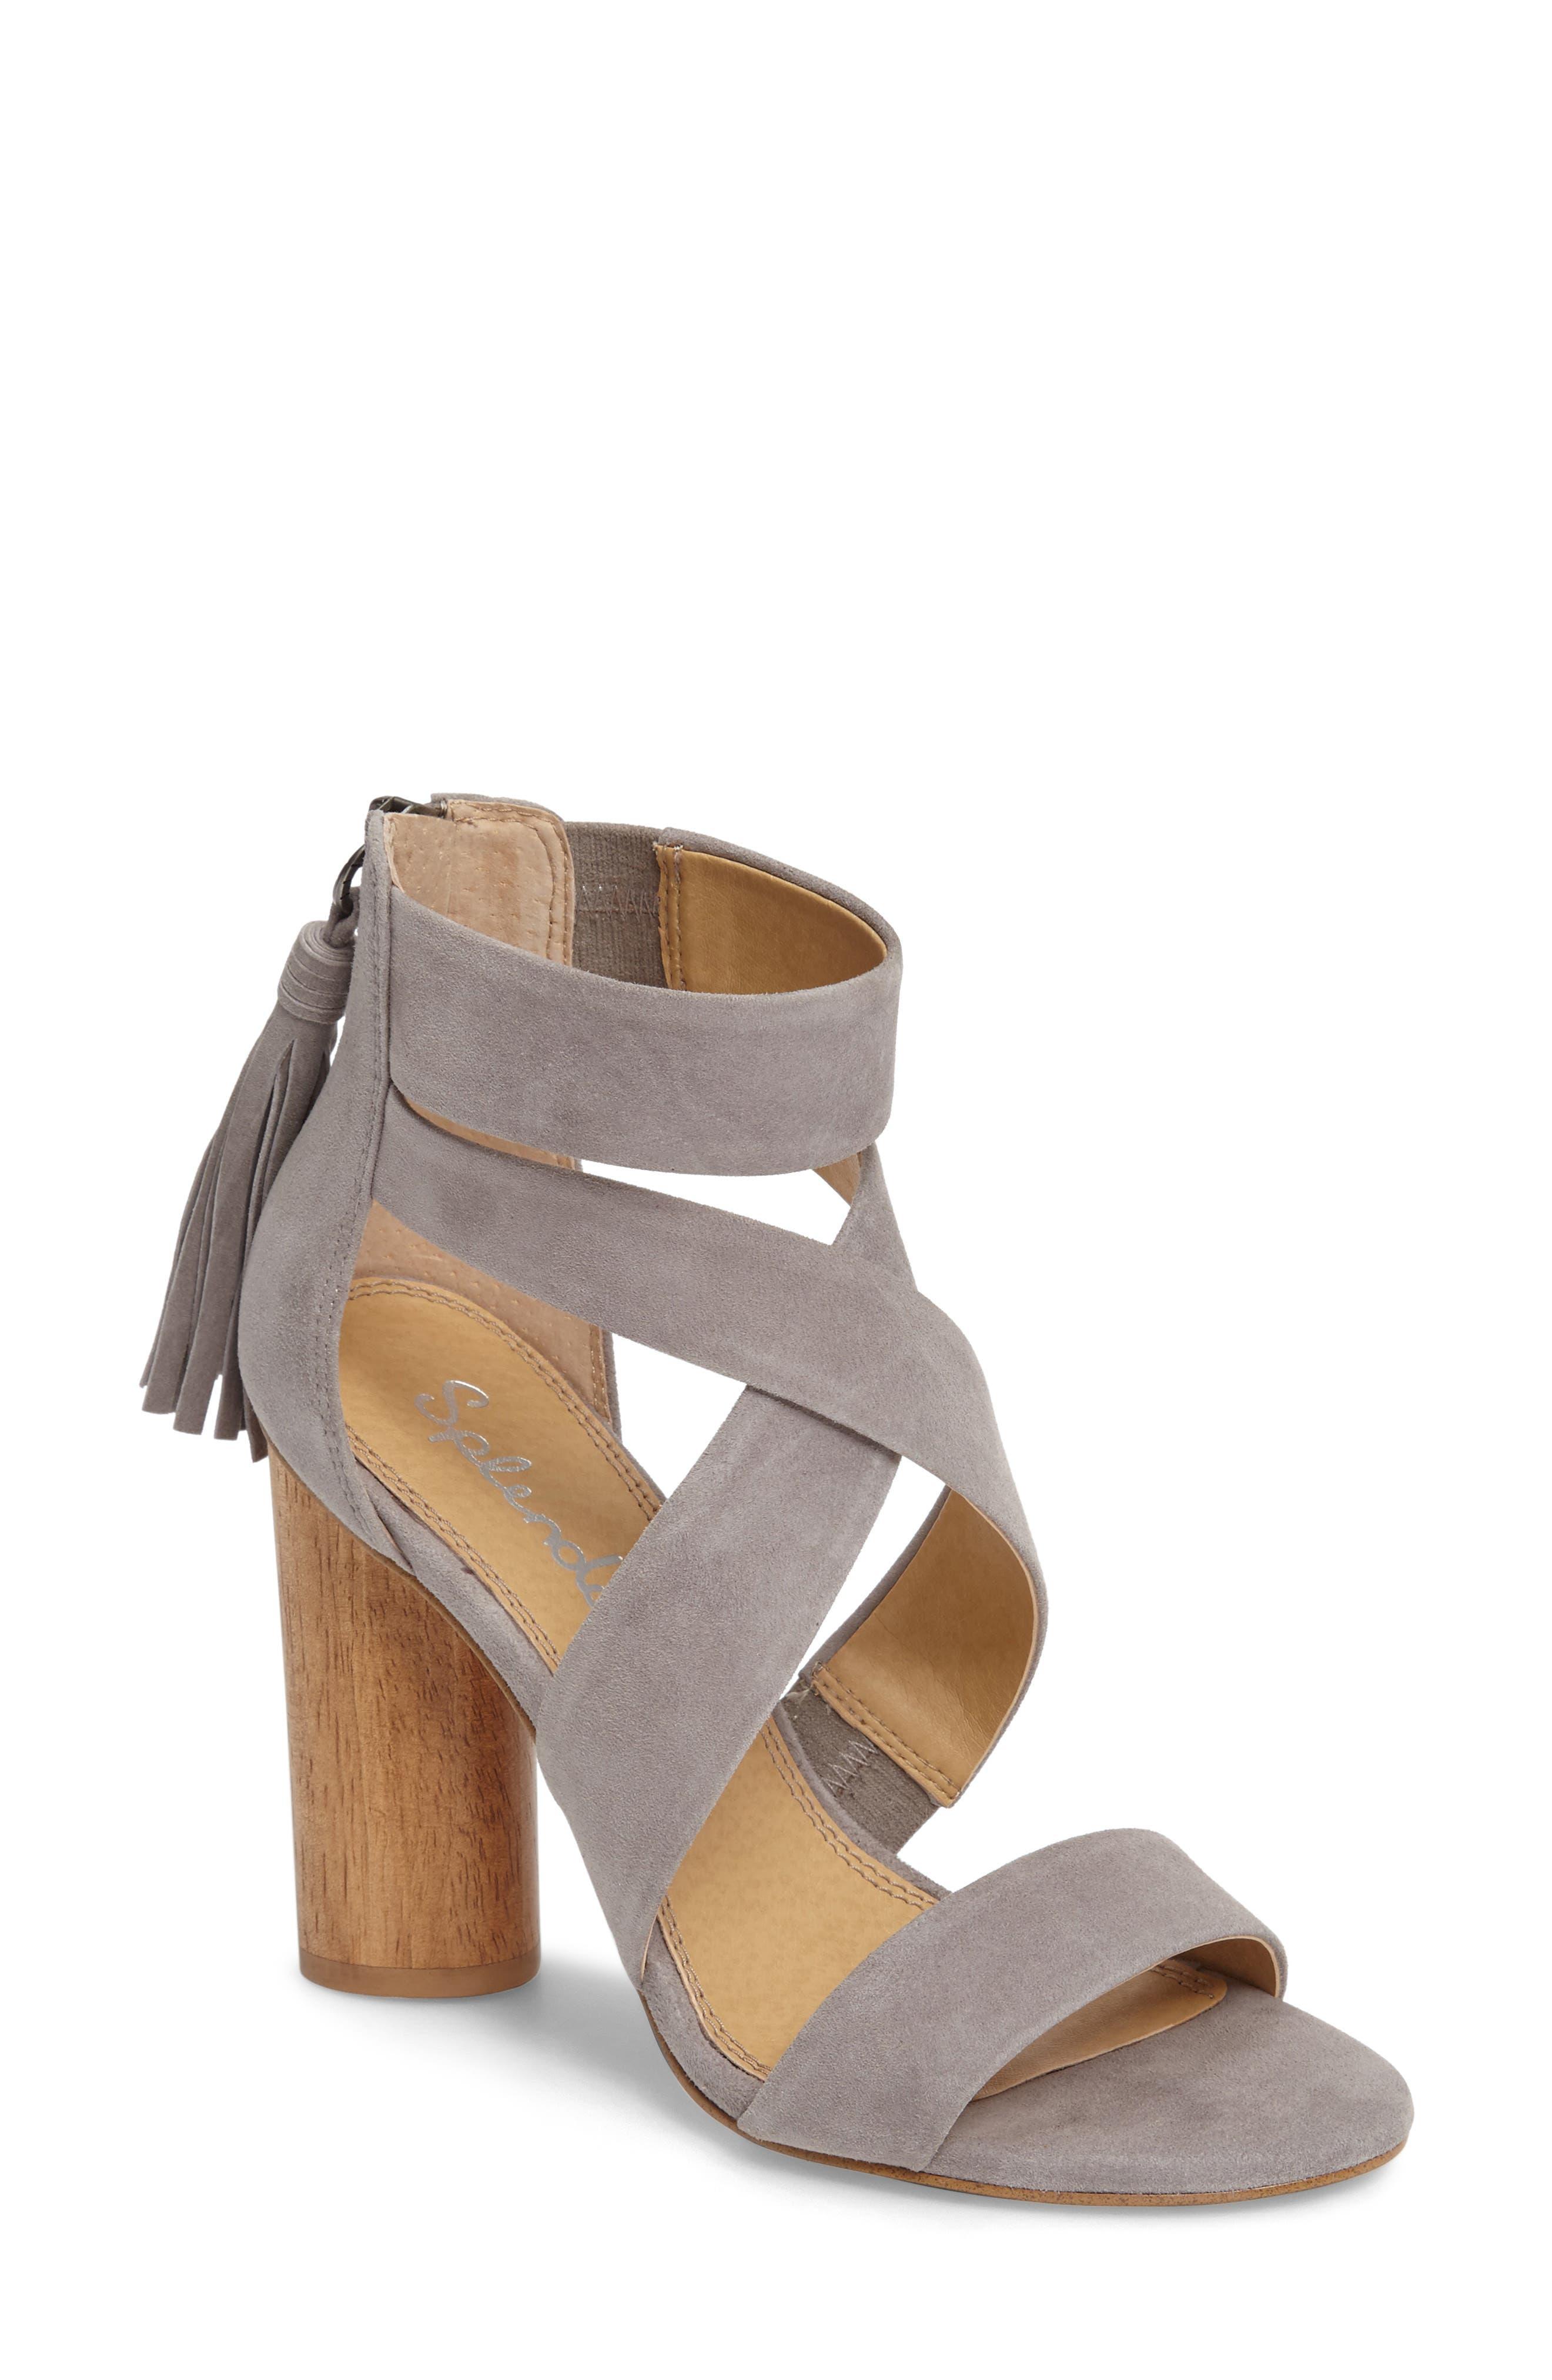 Jara Statement Heel Sandal,                             Main thumbnail 1, color,                             Light Grey Suede